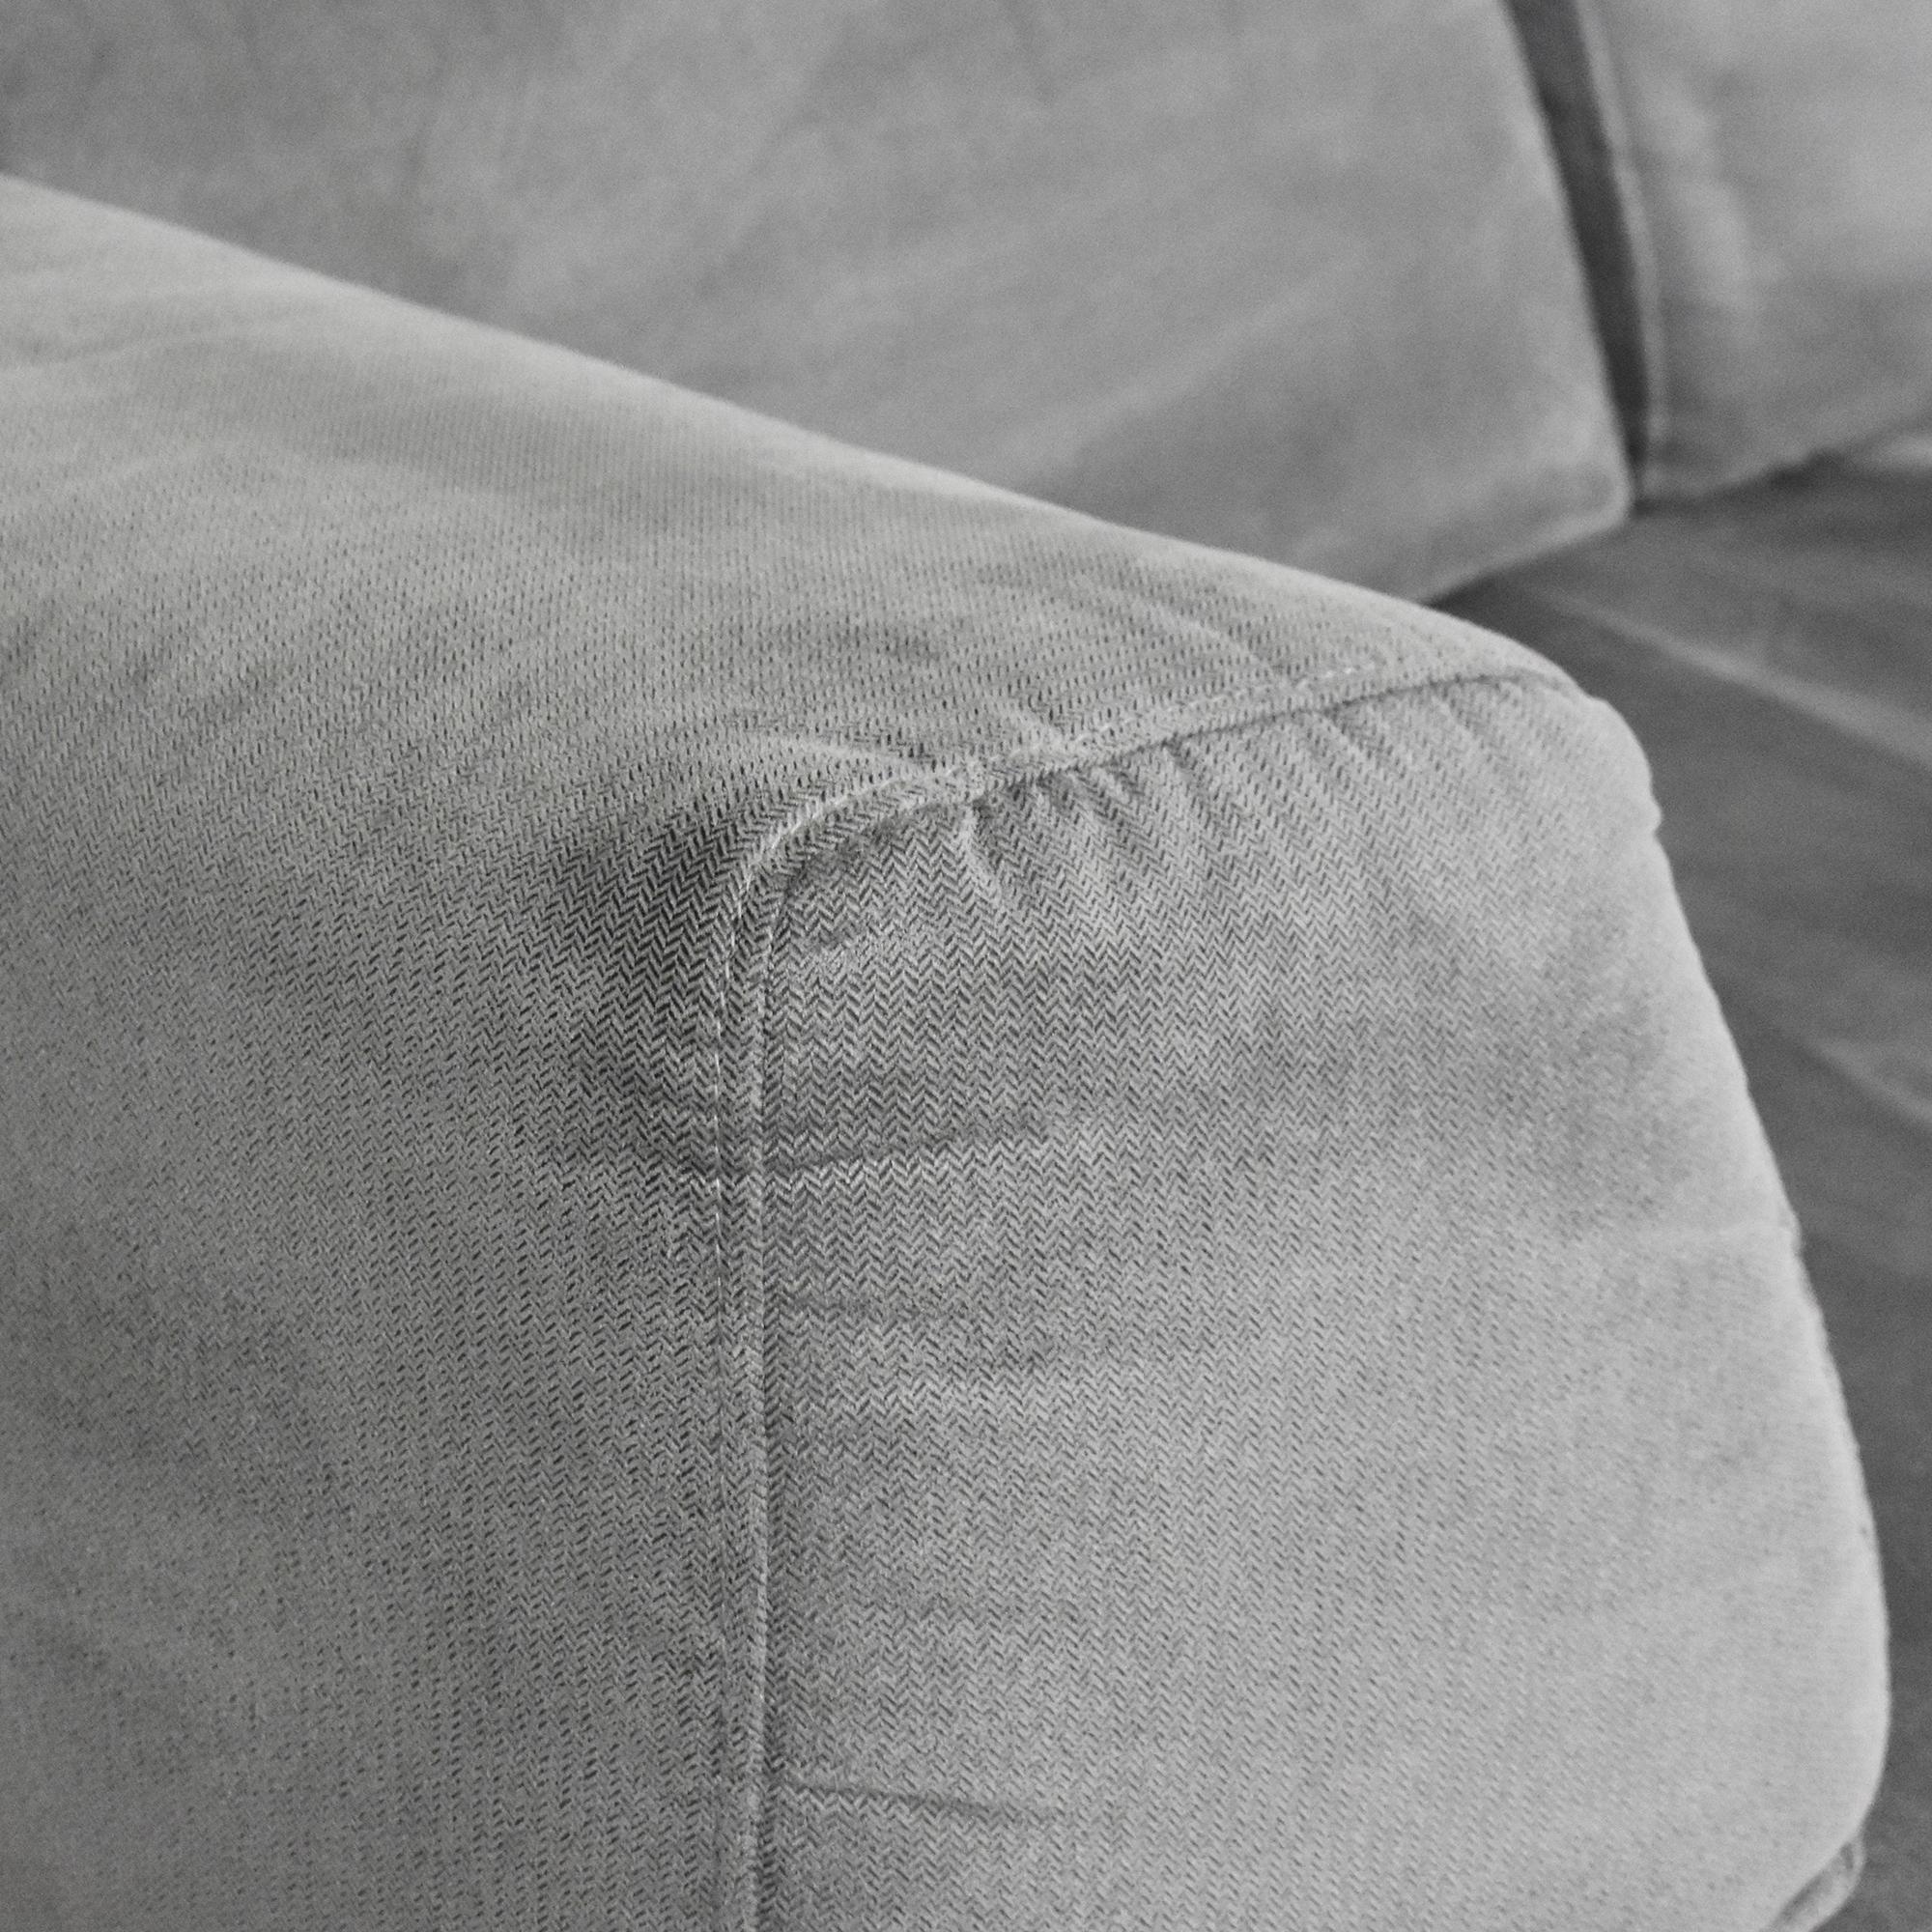 West Elm West Elm Tillary Modular Sofa dimensions